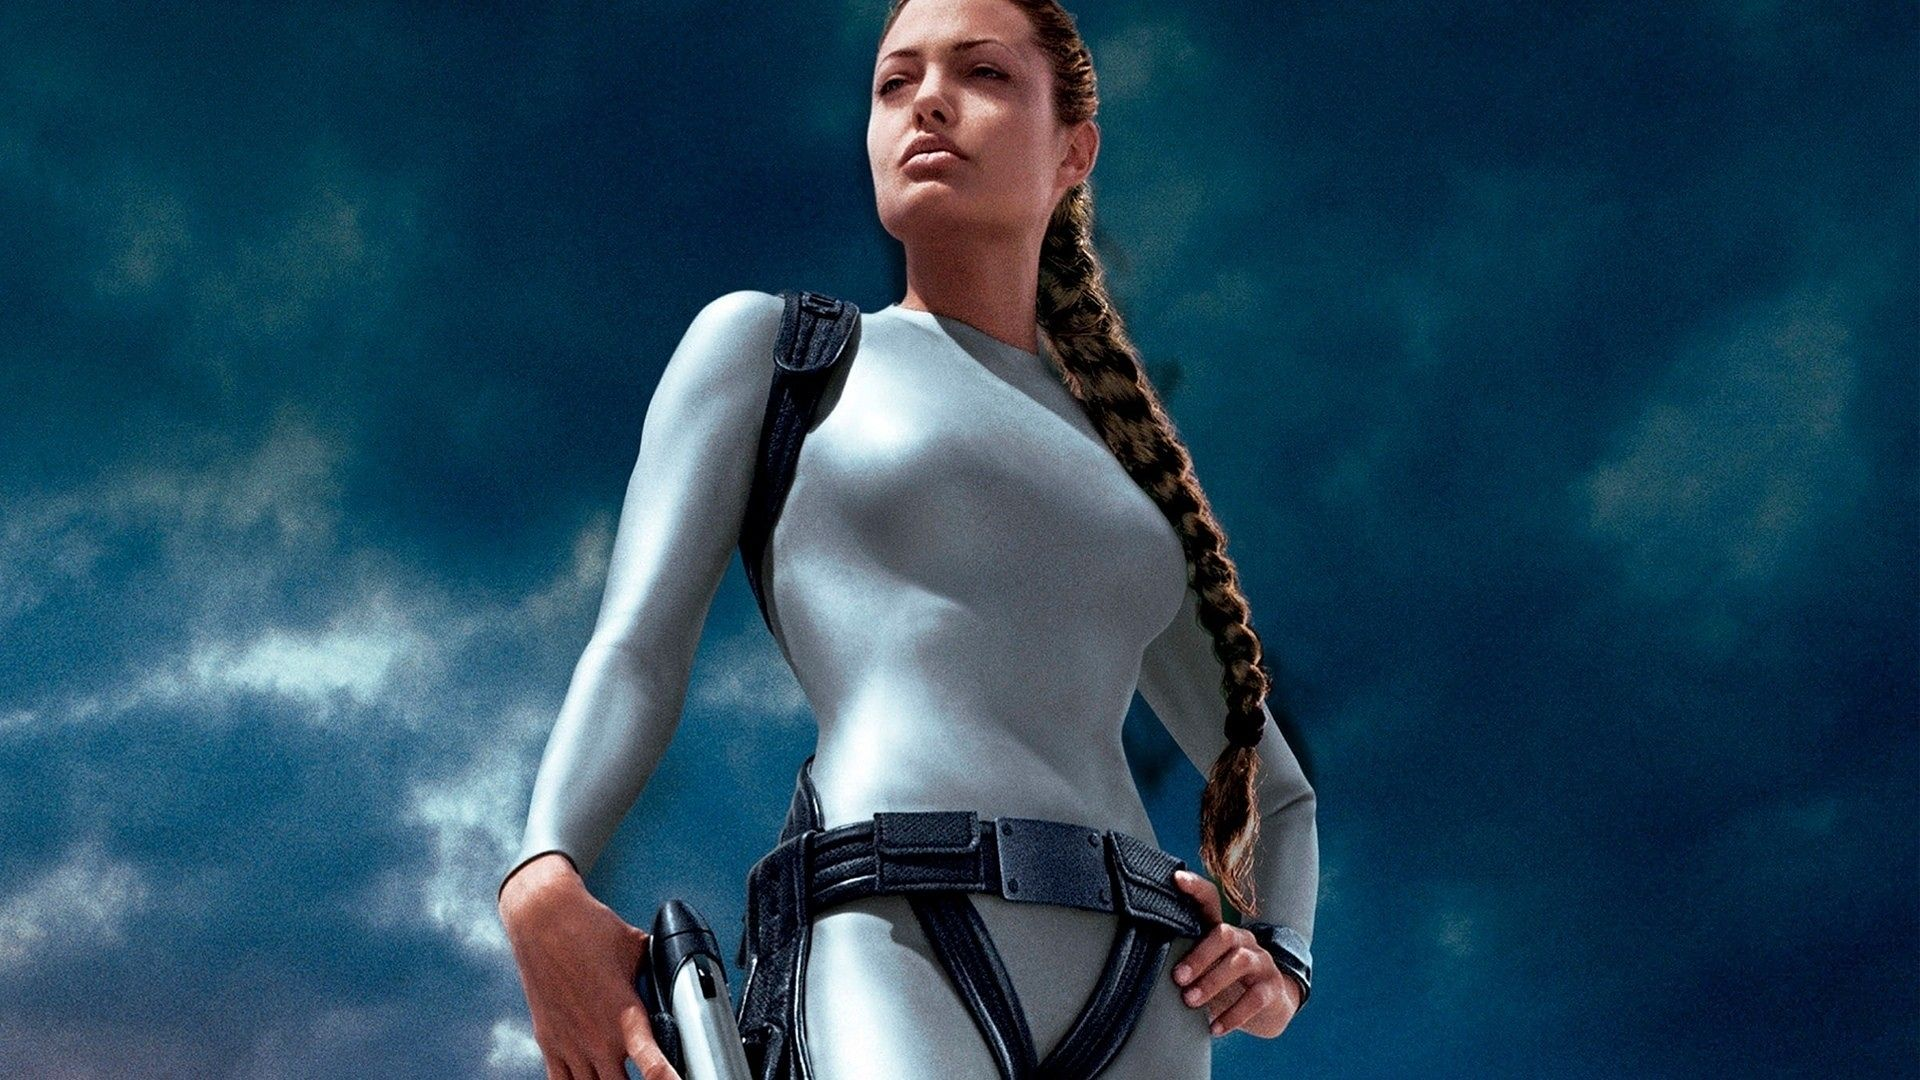 Лара Крофт: Расхитительница гробниц (Lara Croft: Tomb Raider) 2001